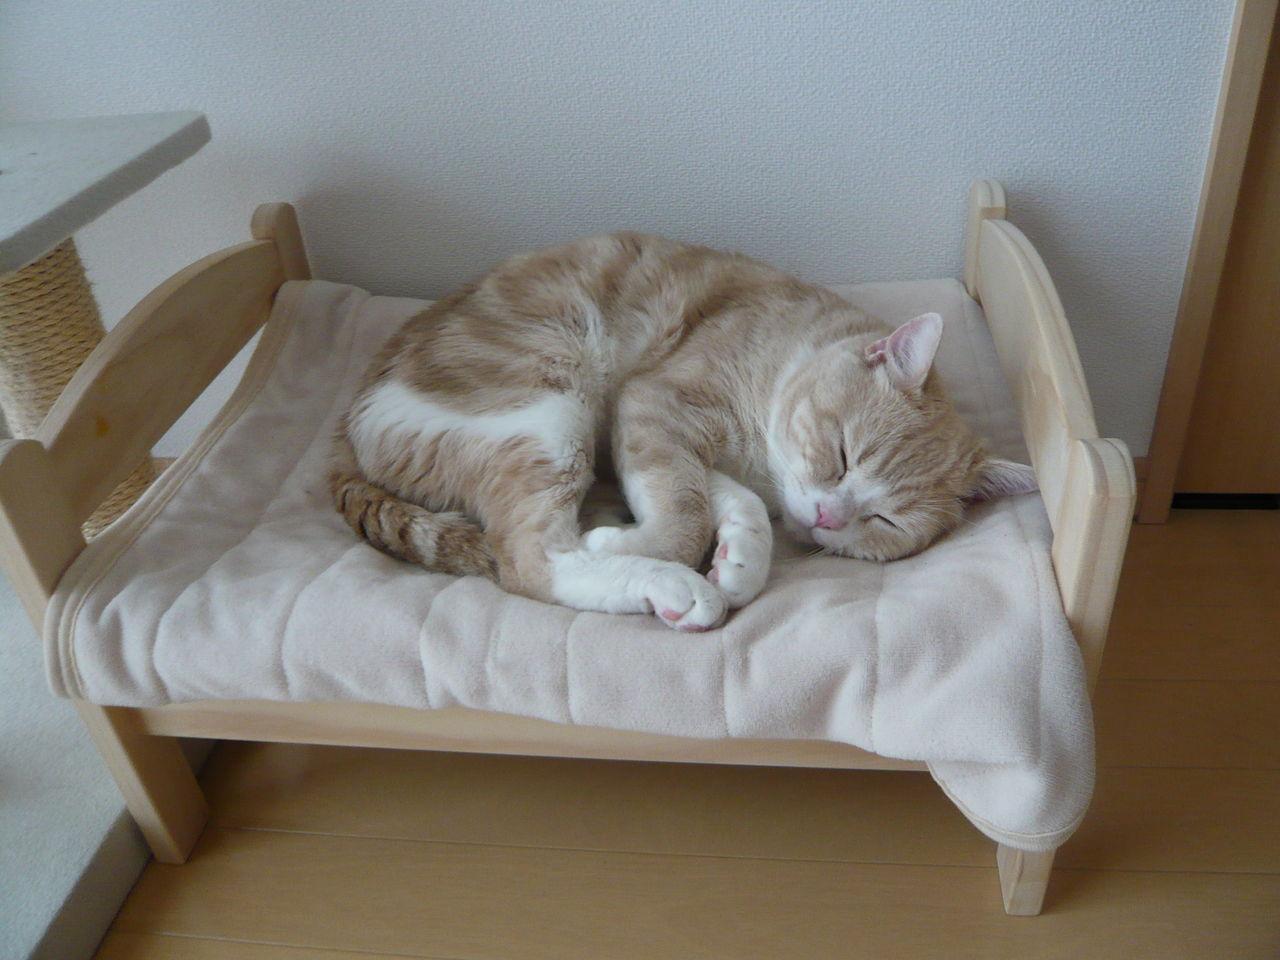 Толстуха спит на матрасе фото 4 фотография